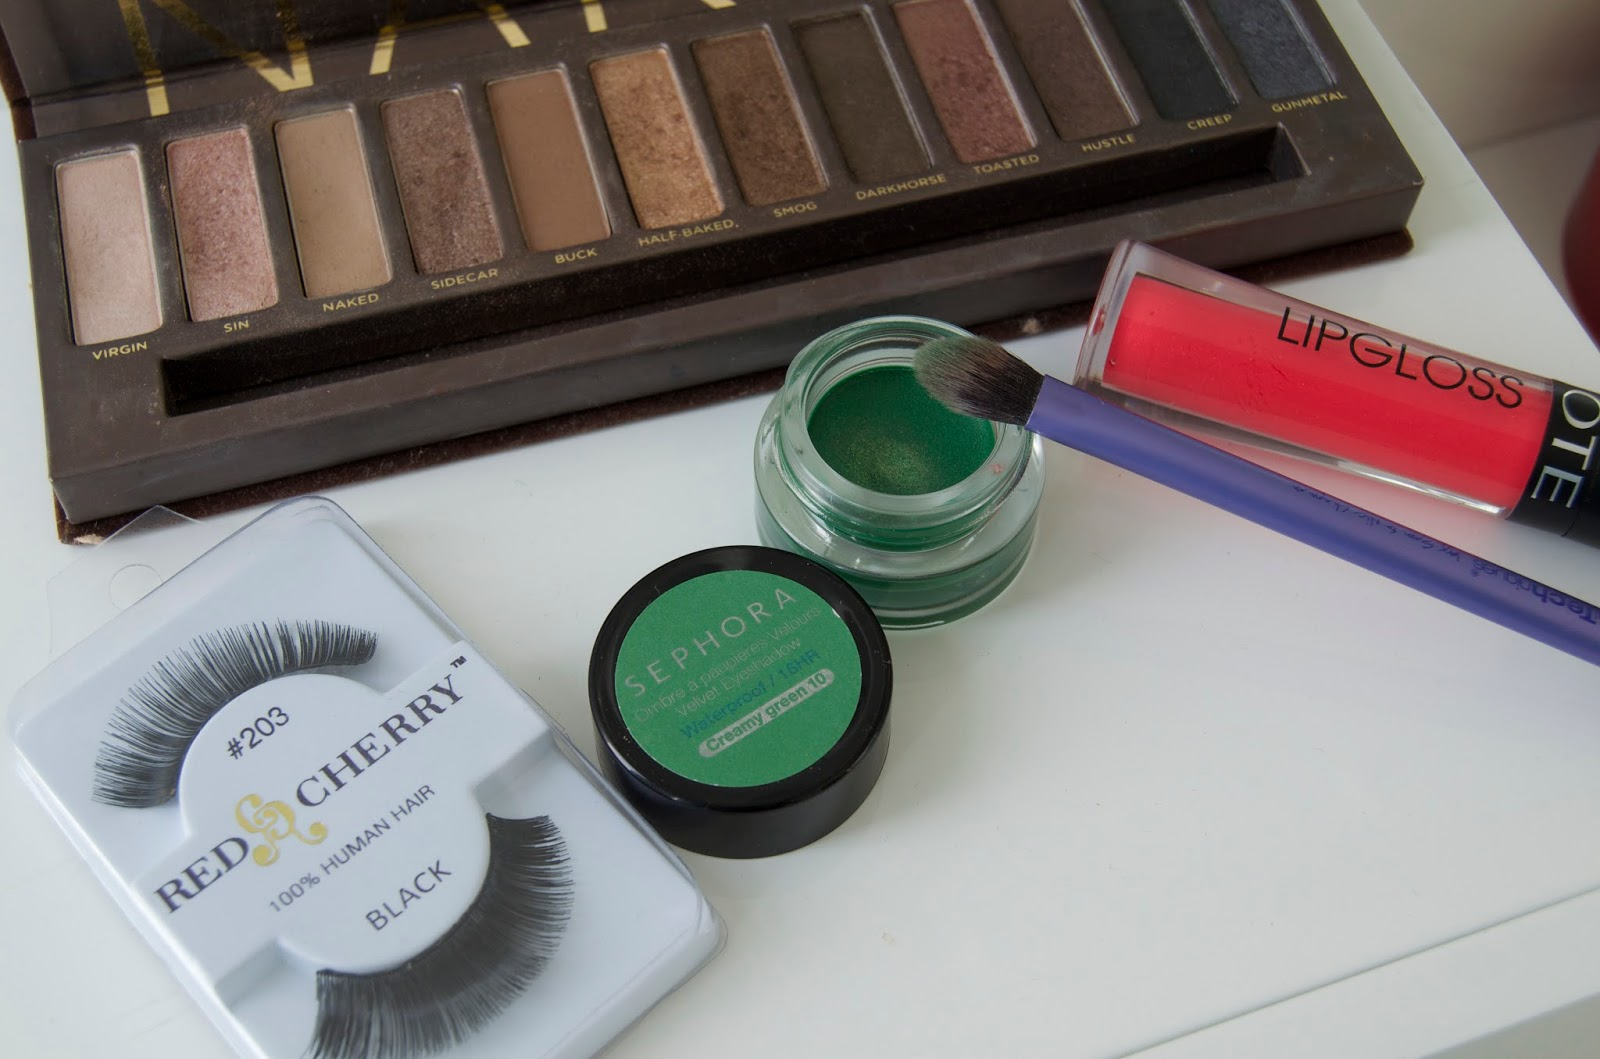 3f6f0b2da0d8d Sephora Gel Eyeliner in Creamy Green | Style & Glaze | Bloglovin'